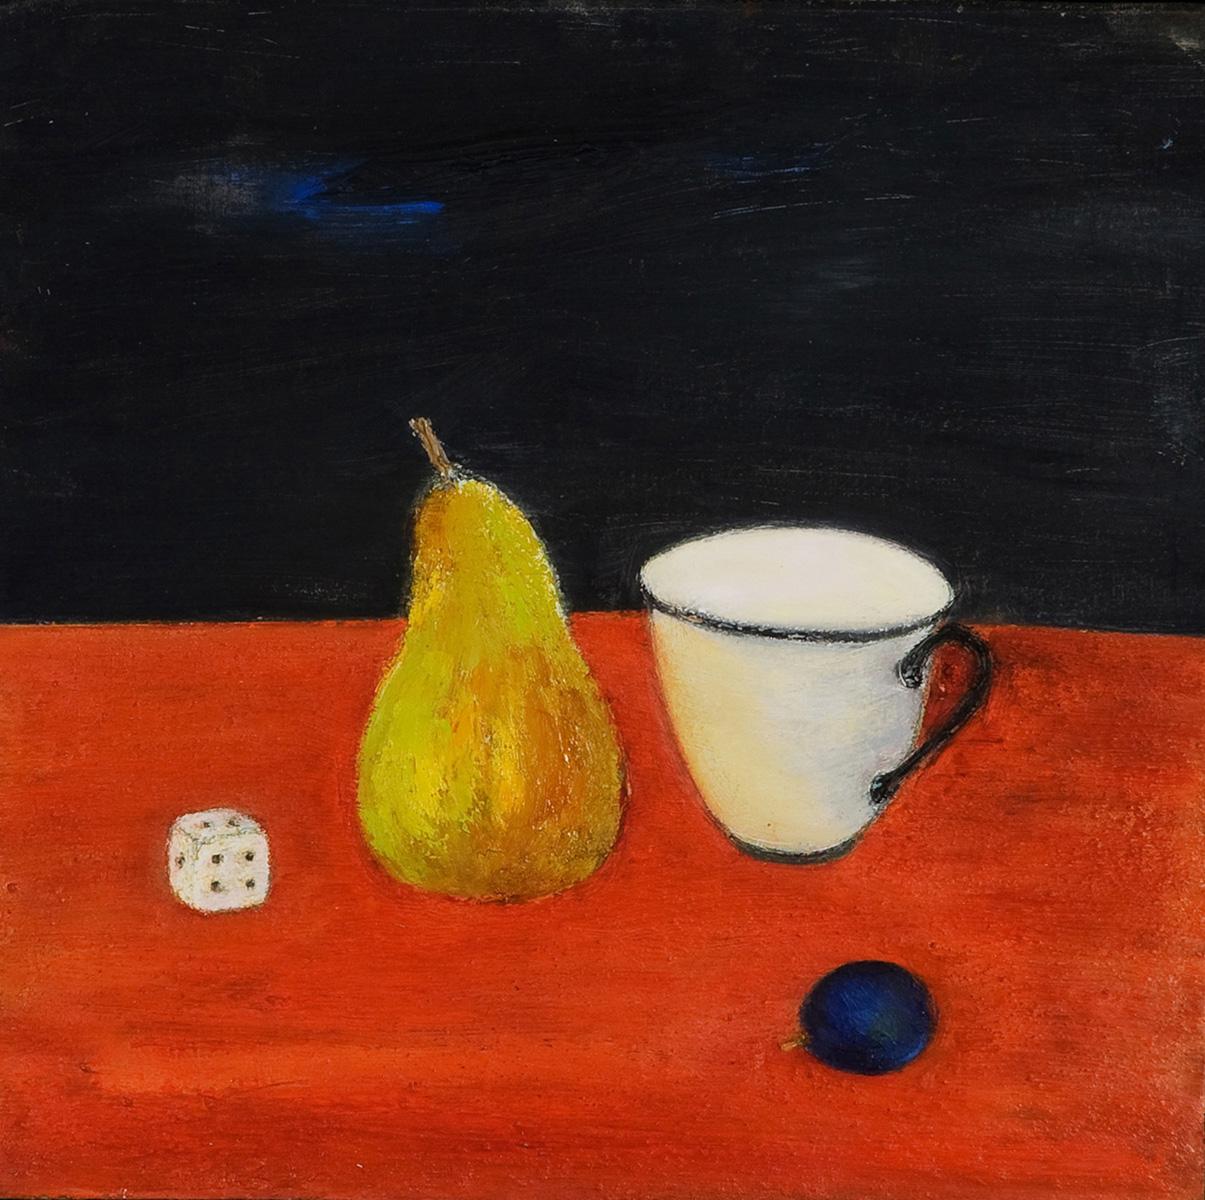 Pear & Dice